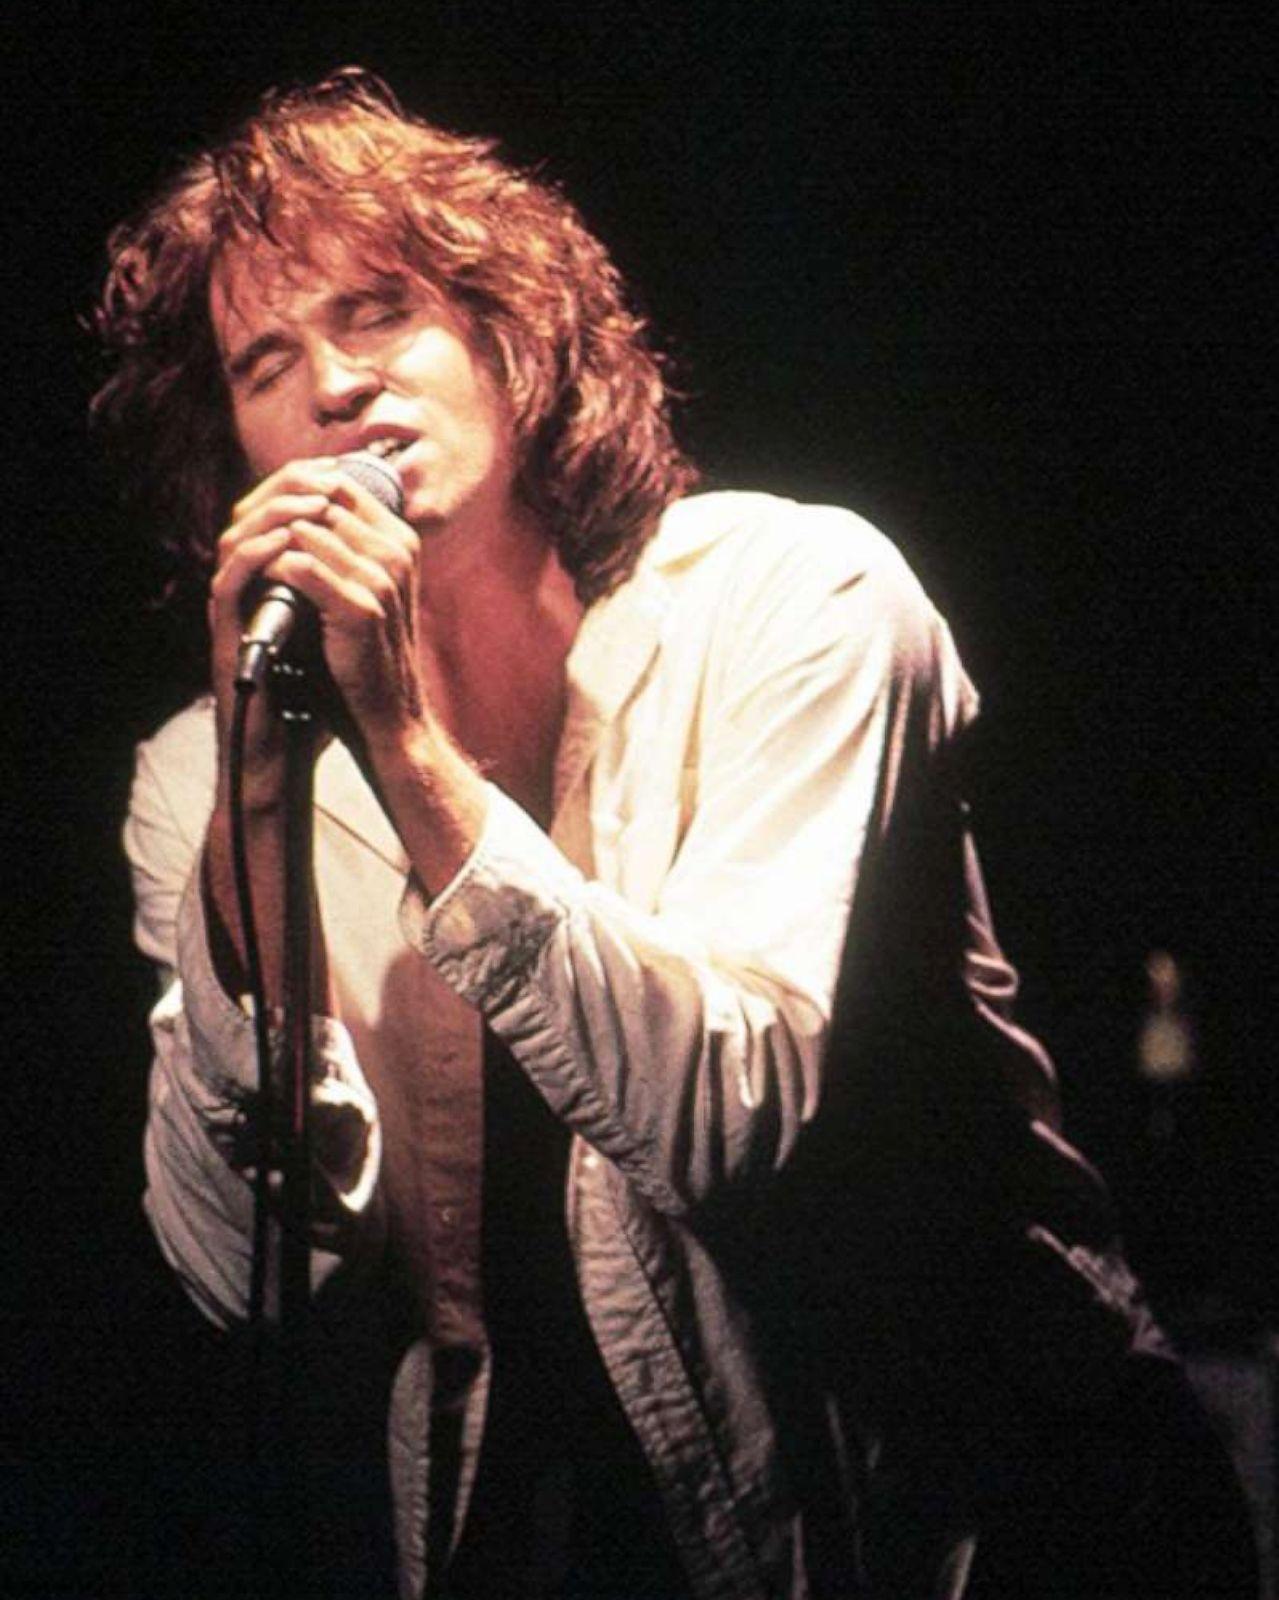 sc 1 st  ABC News & PHOTO: Val Kilmer as Jim Morrison in